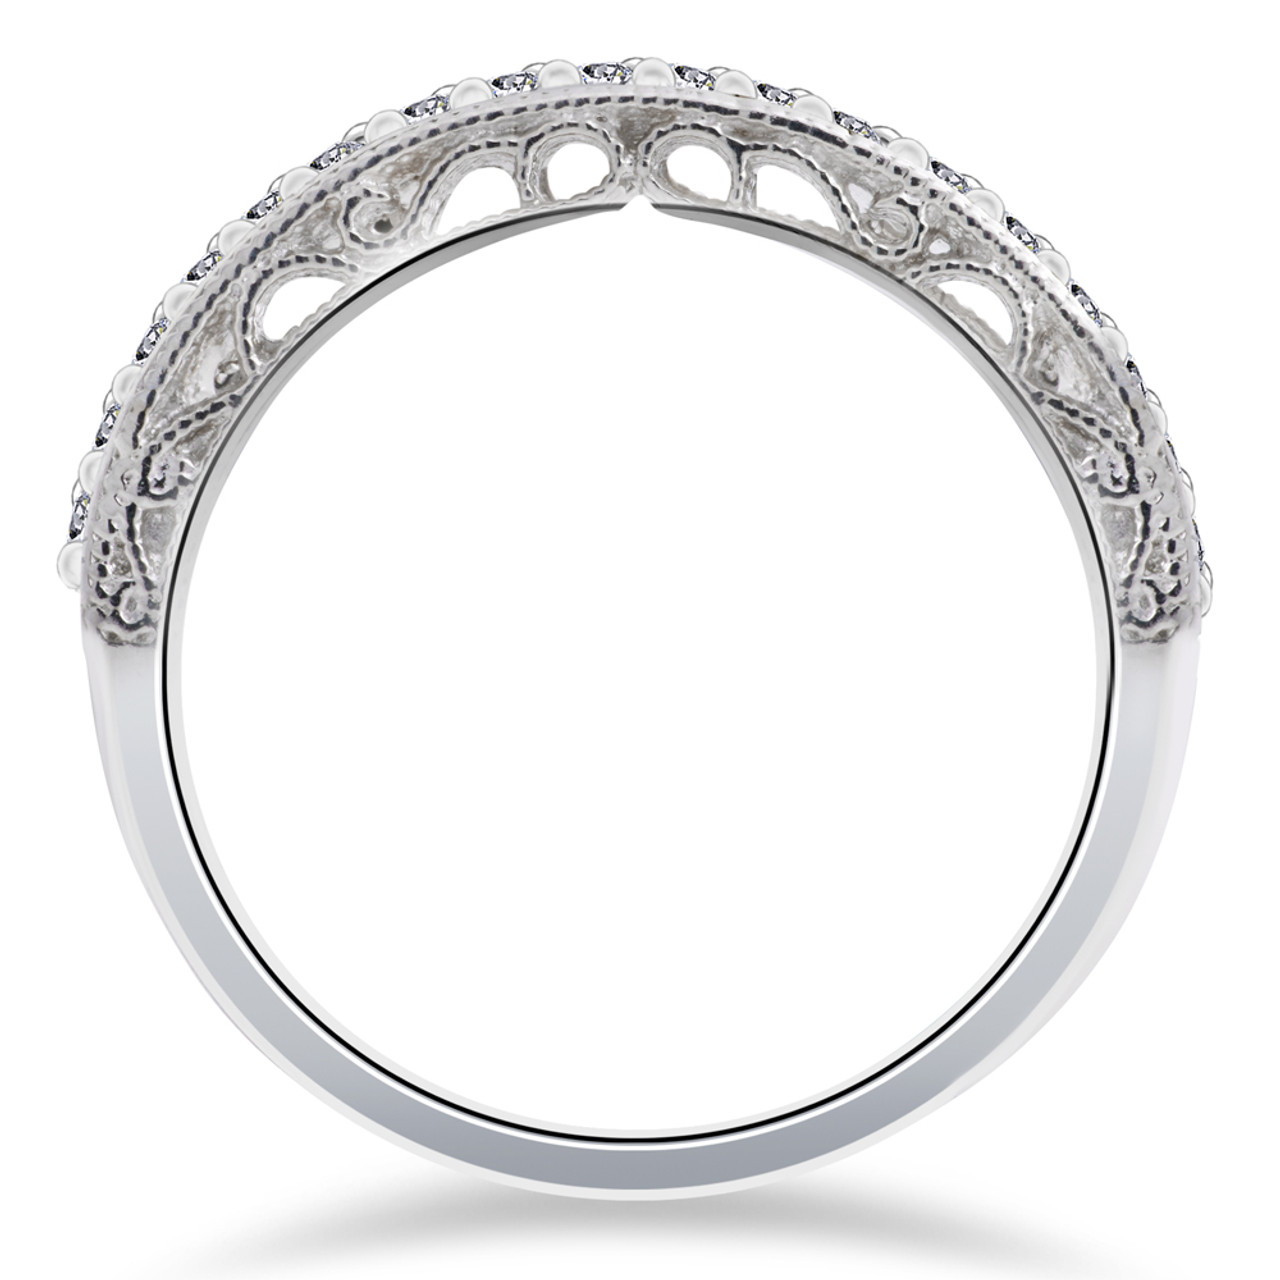 1 2 Ct Vivian Lab Created Diamond Wedding Ring 14k White Gold F Vs